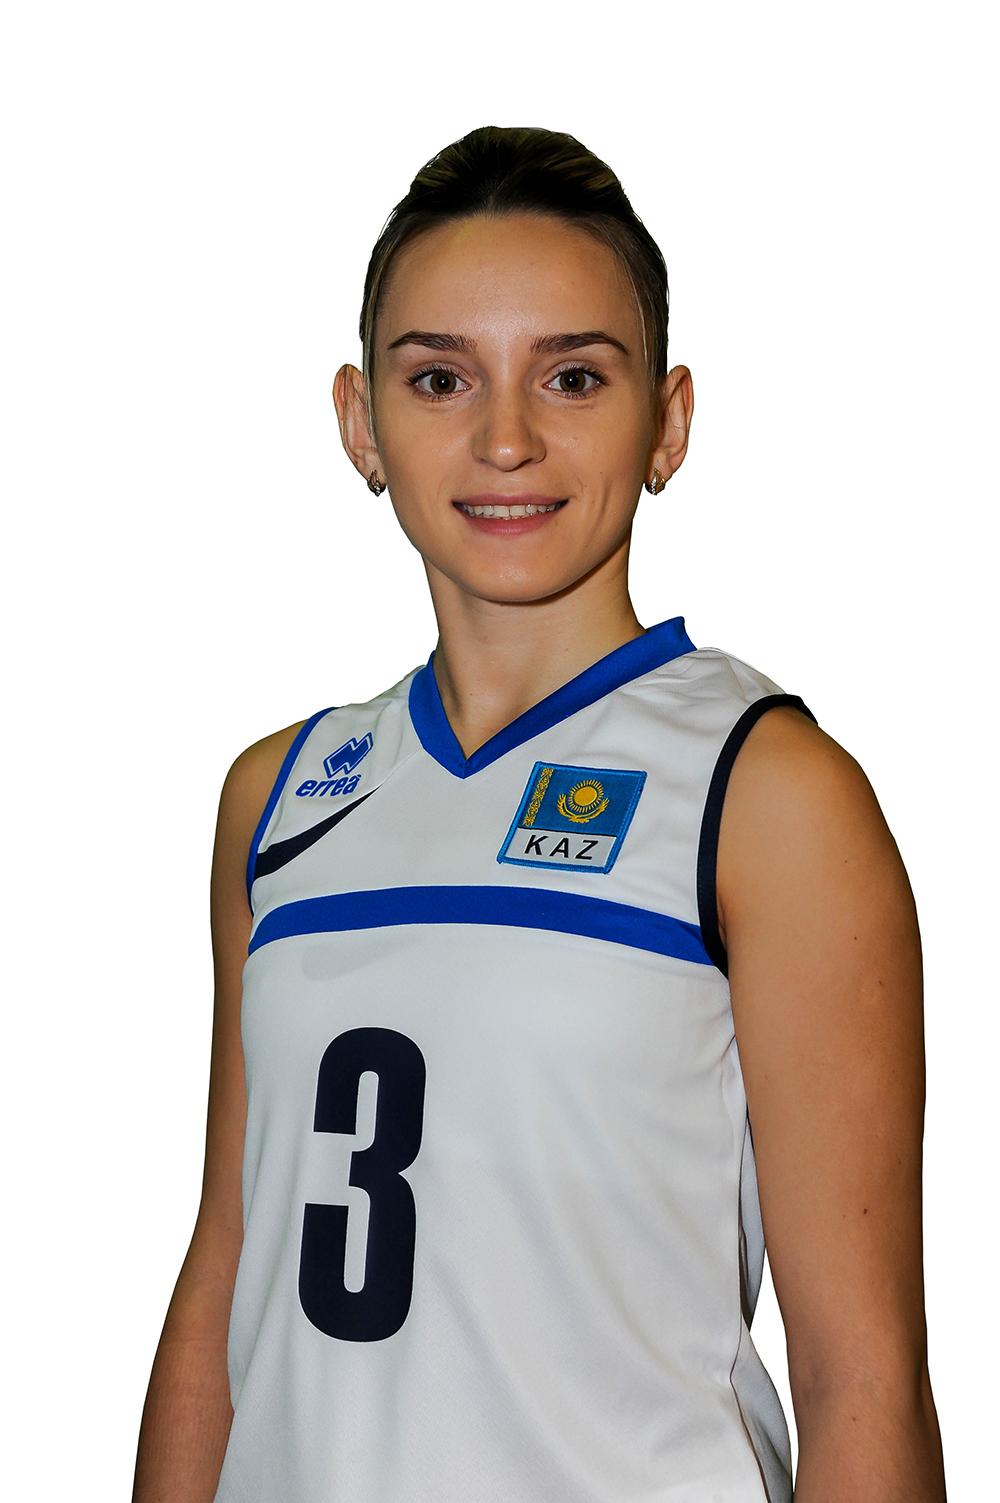 Diana Kempa